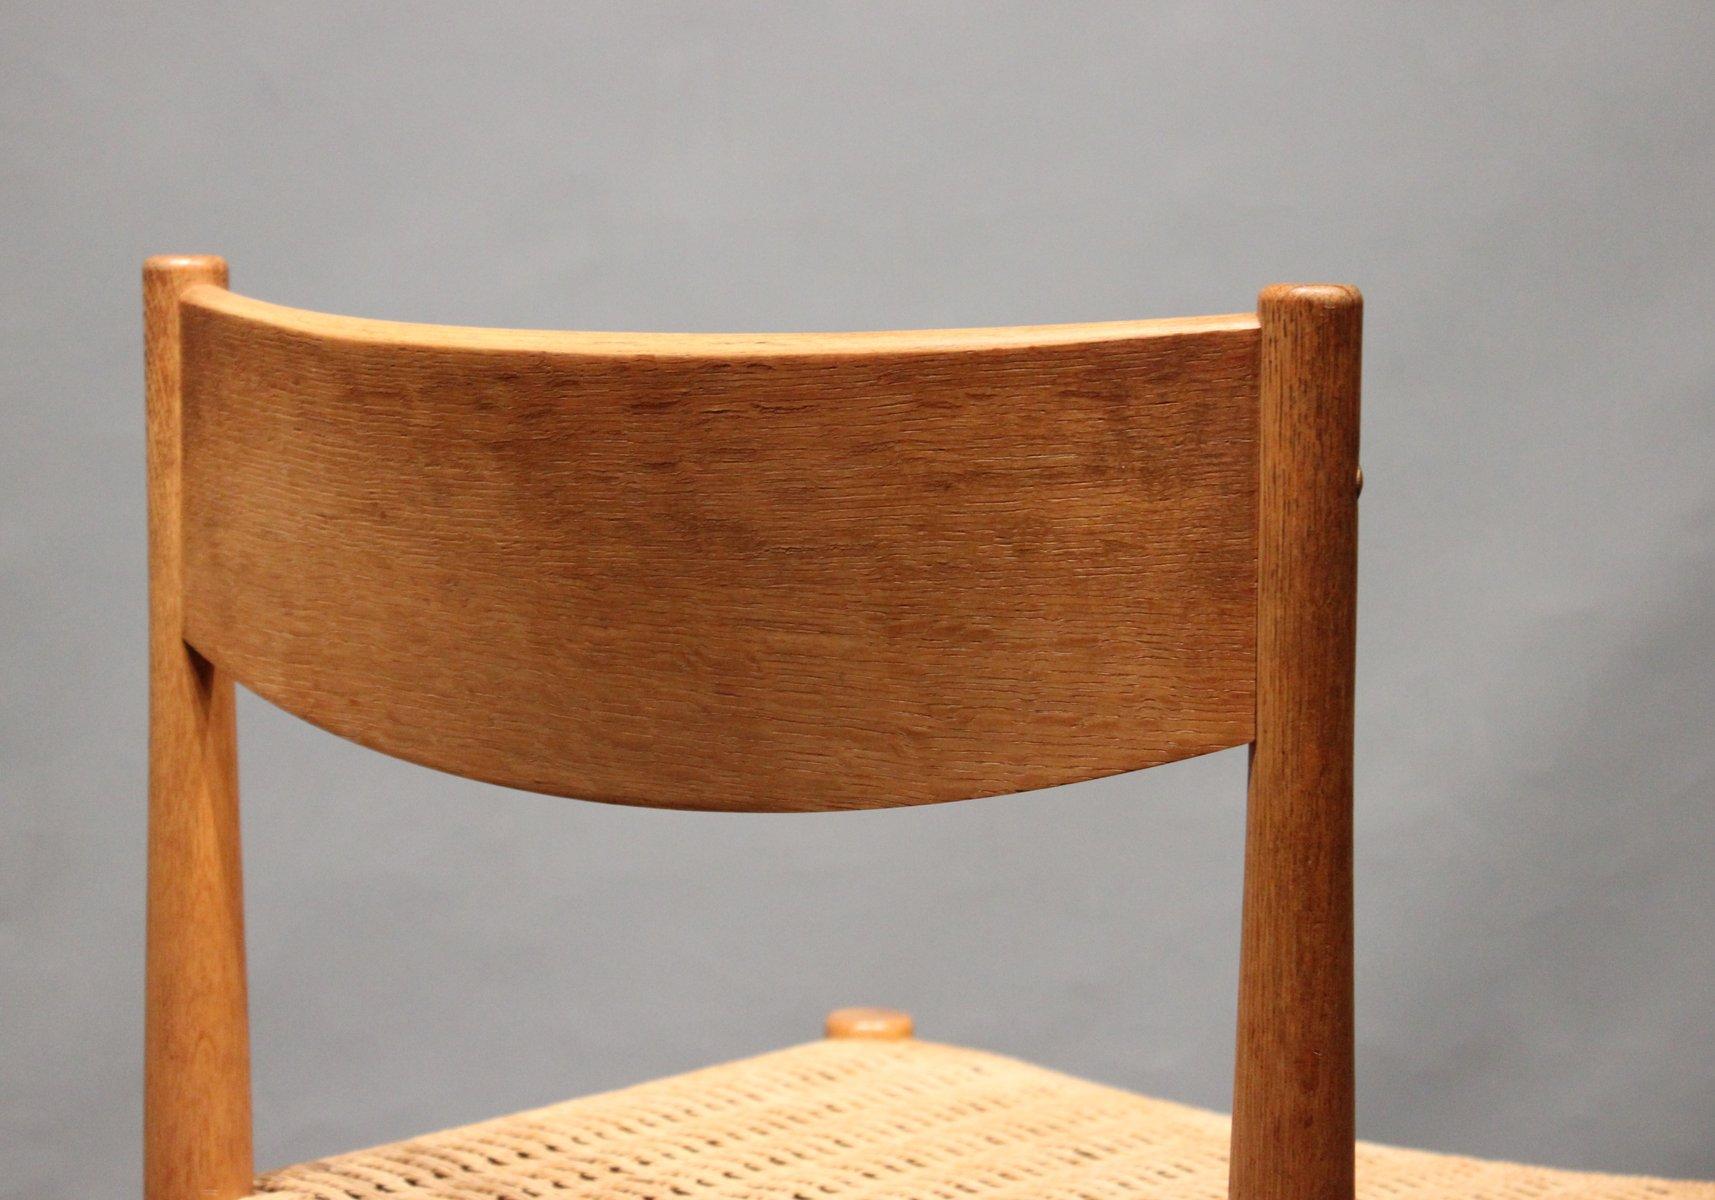 esszimmerst hle aus eiche von poul m volther f r frem. Black Bedroom Furniture Sets. Home Design Ideas